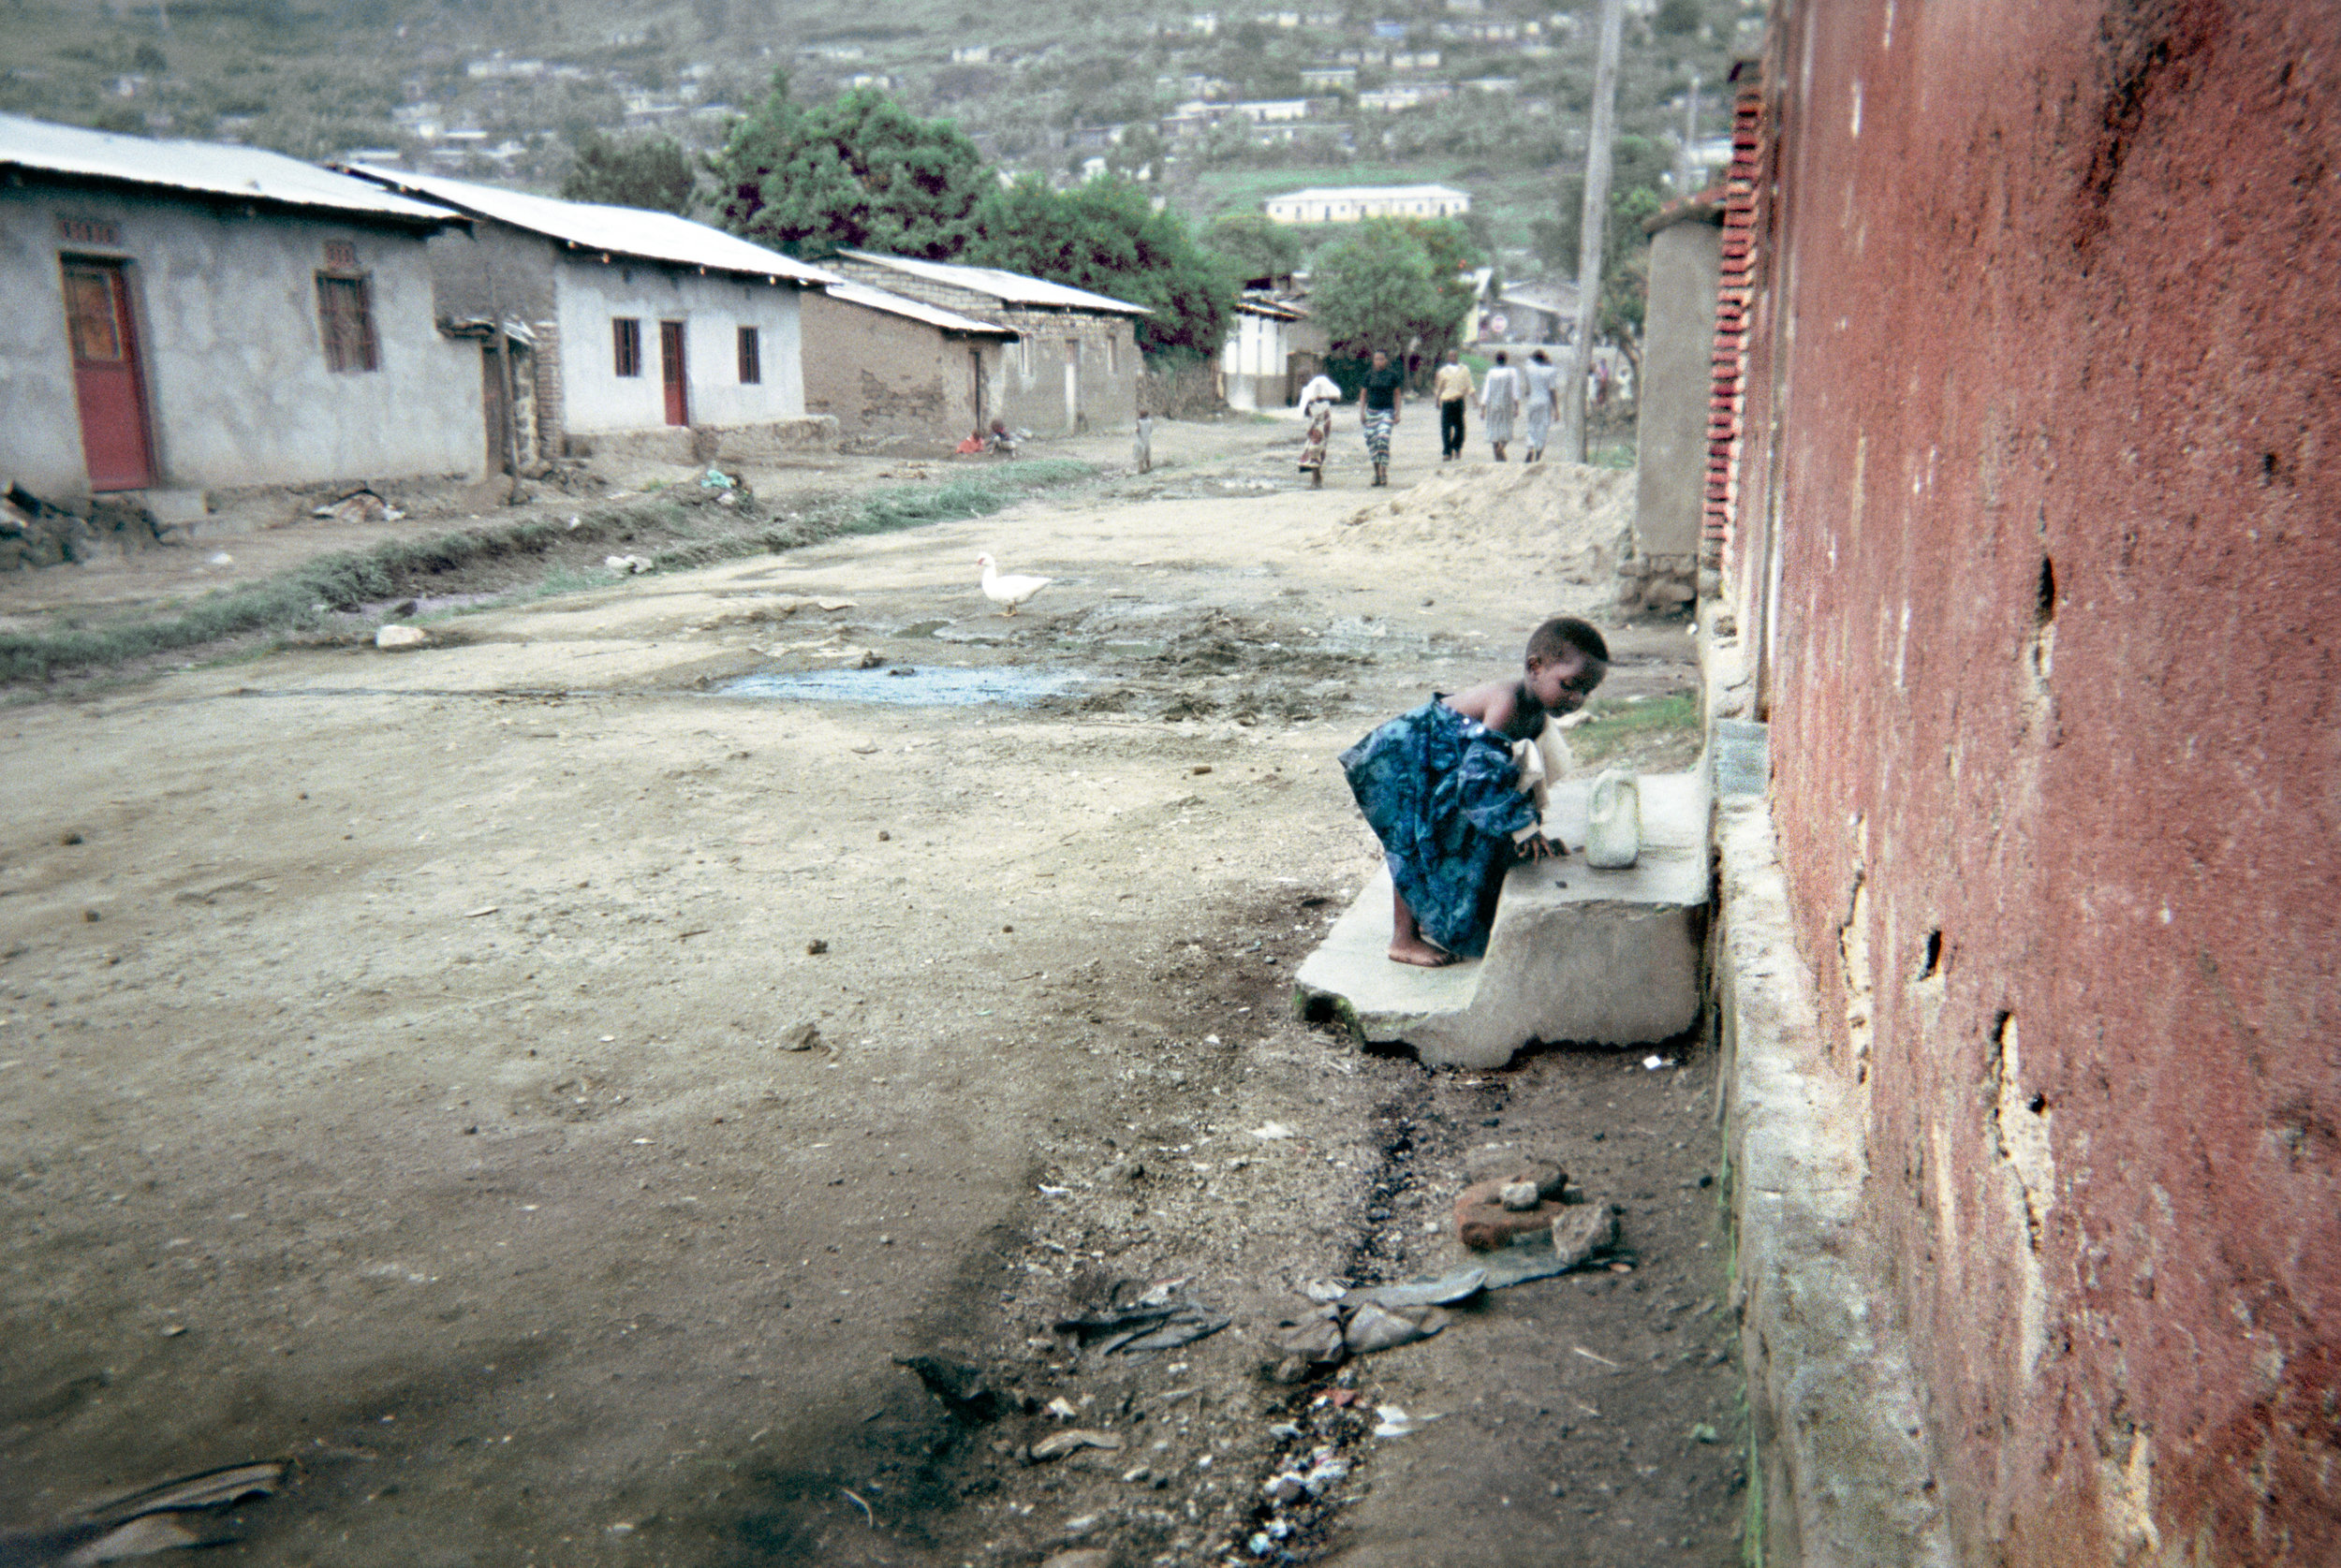 Child on Stoop by Claudine MASTERC-2.jpg